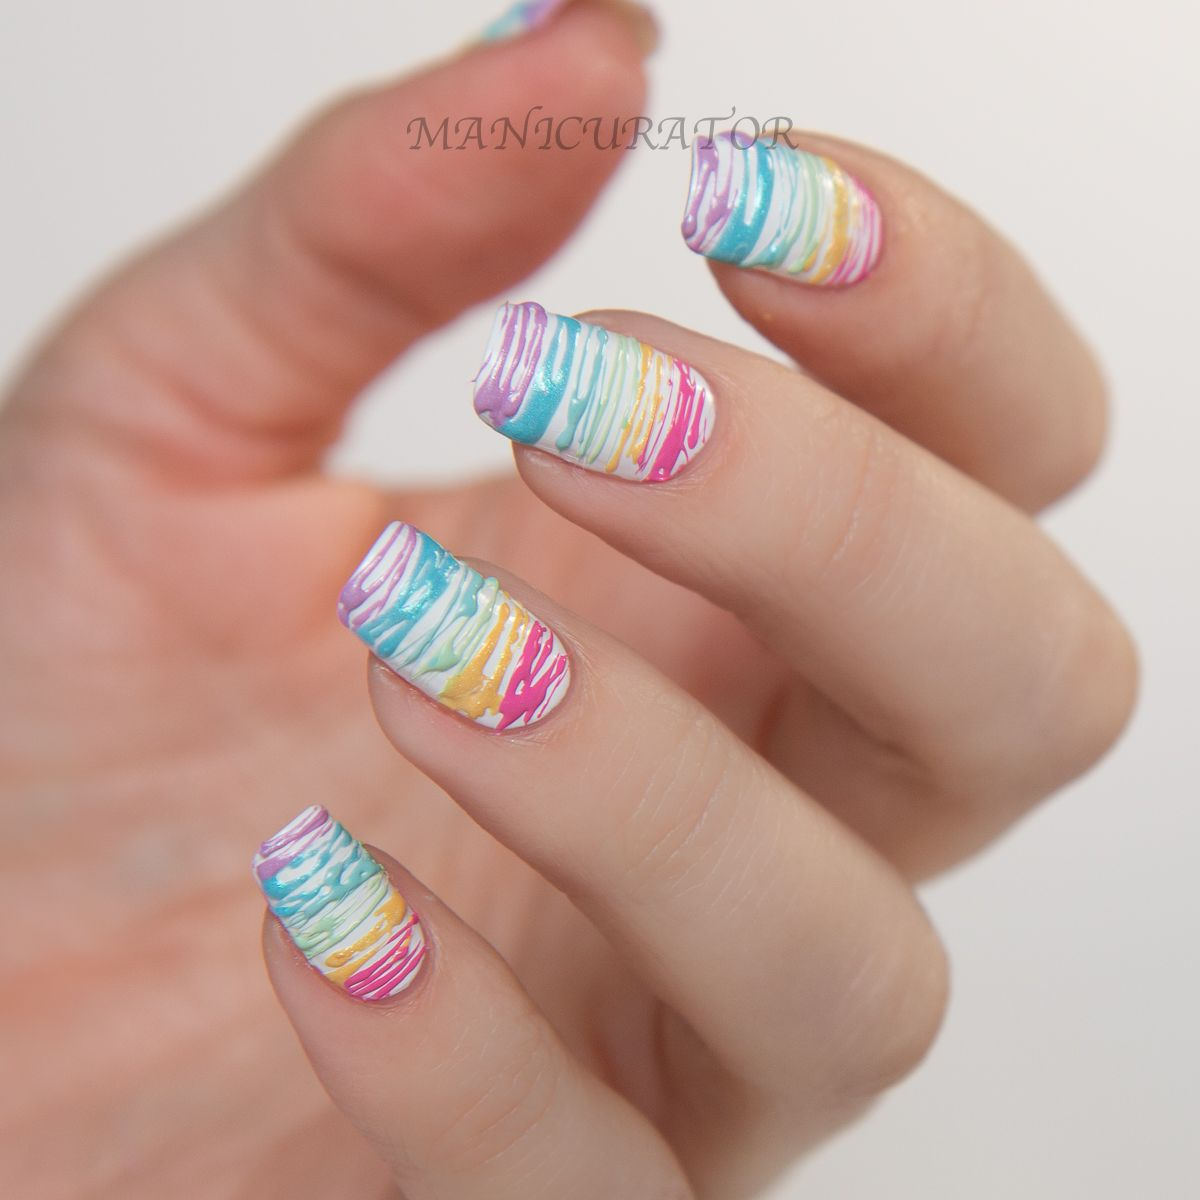 nail art 2015 - Google Search | :: Nail Art :: | Pinterest | Spring ...